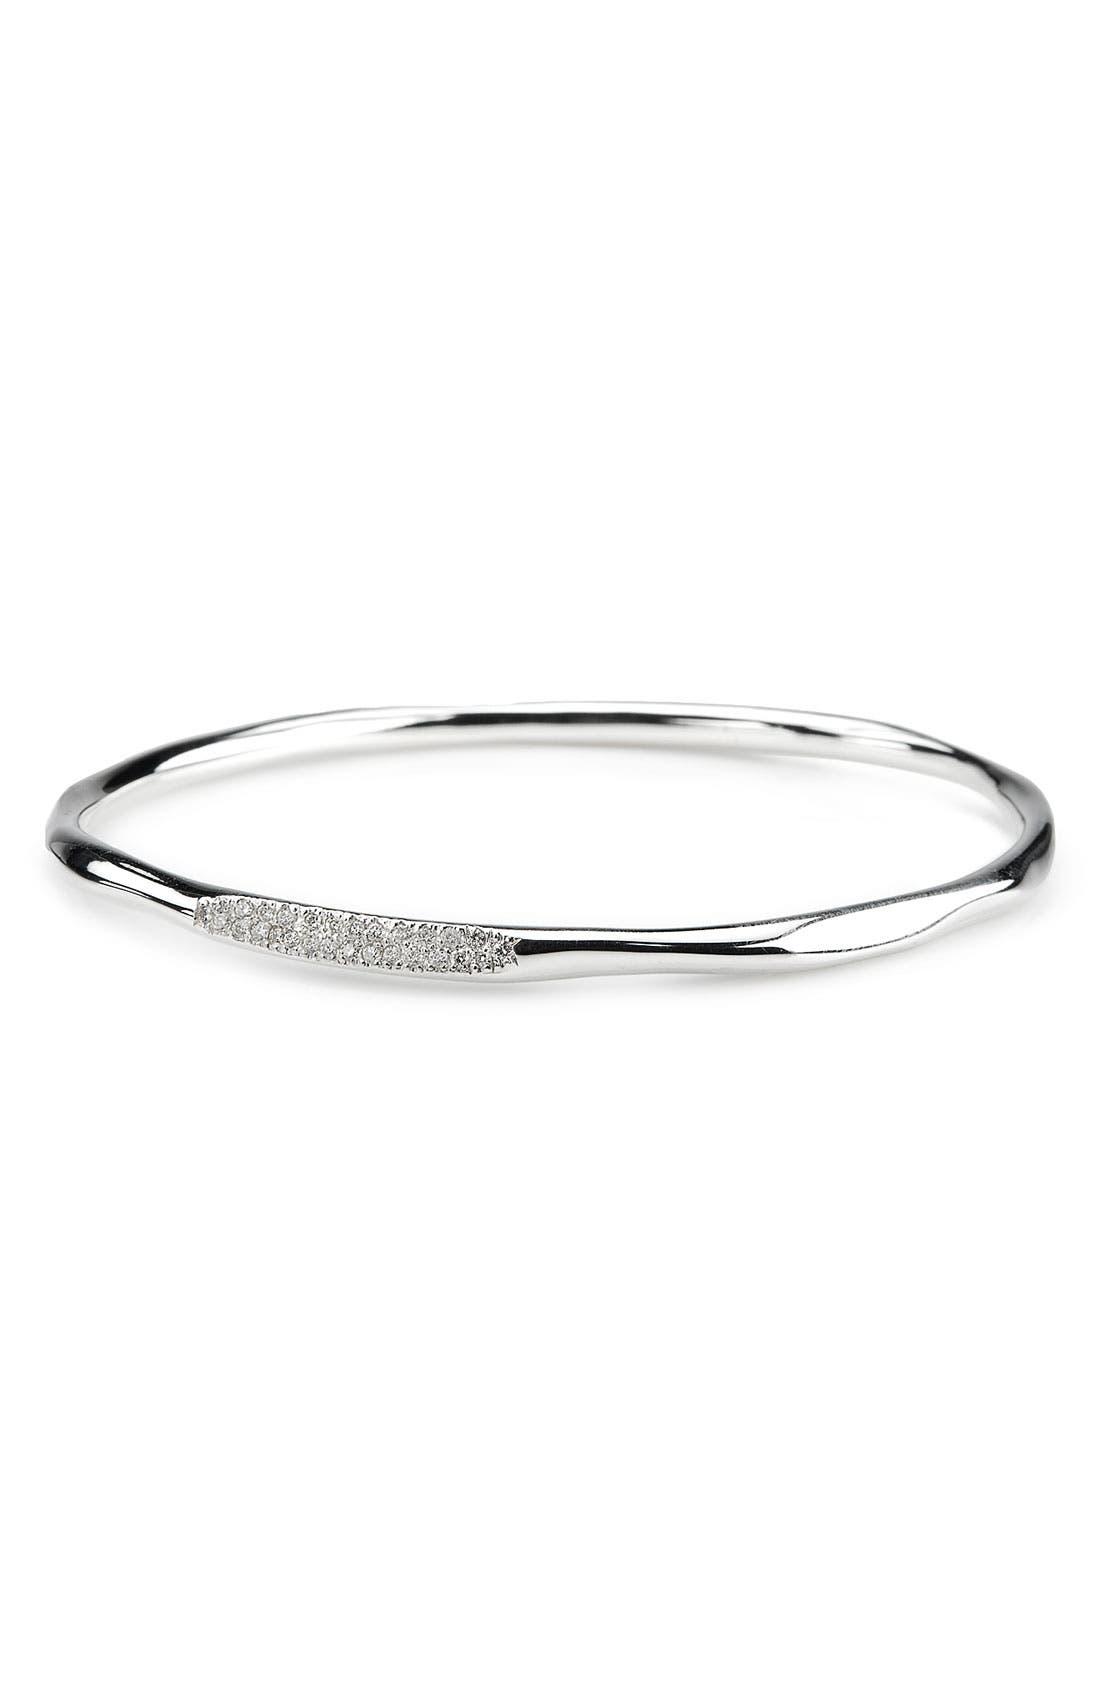 Alternate Image 1 Selected - Ippolita 'Silver Rain' Diamond Pavé Bangle